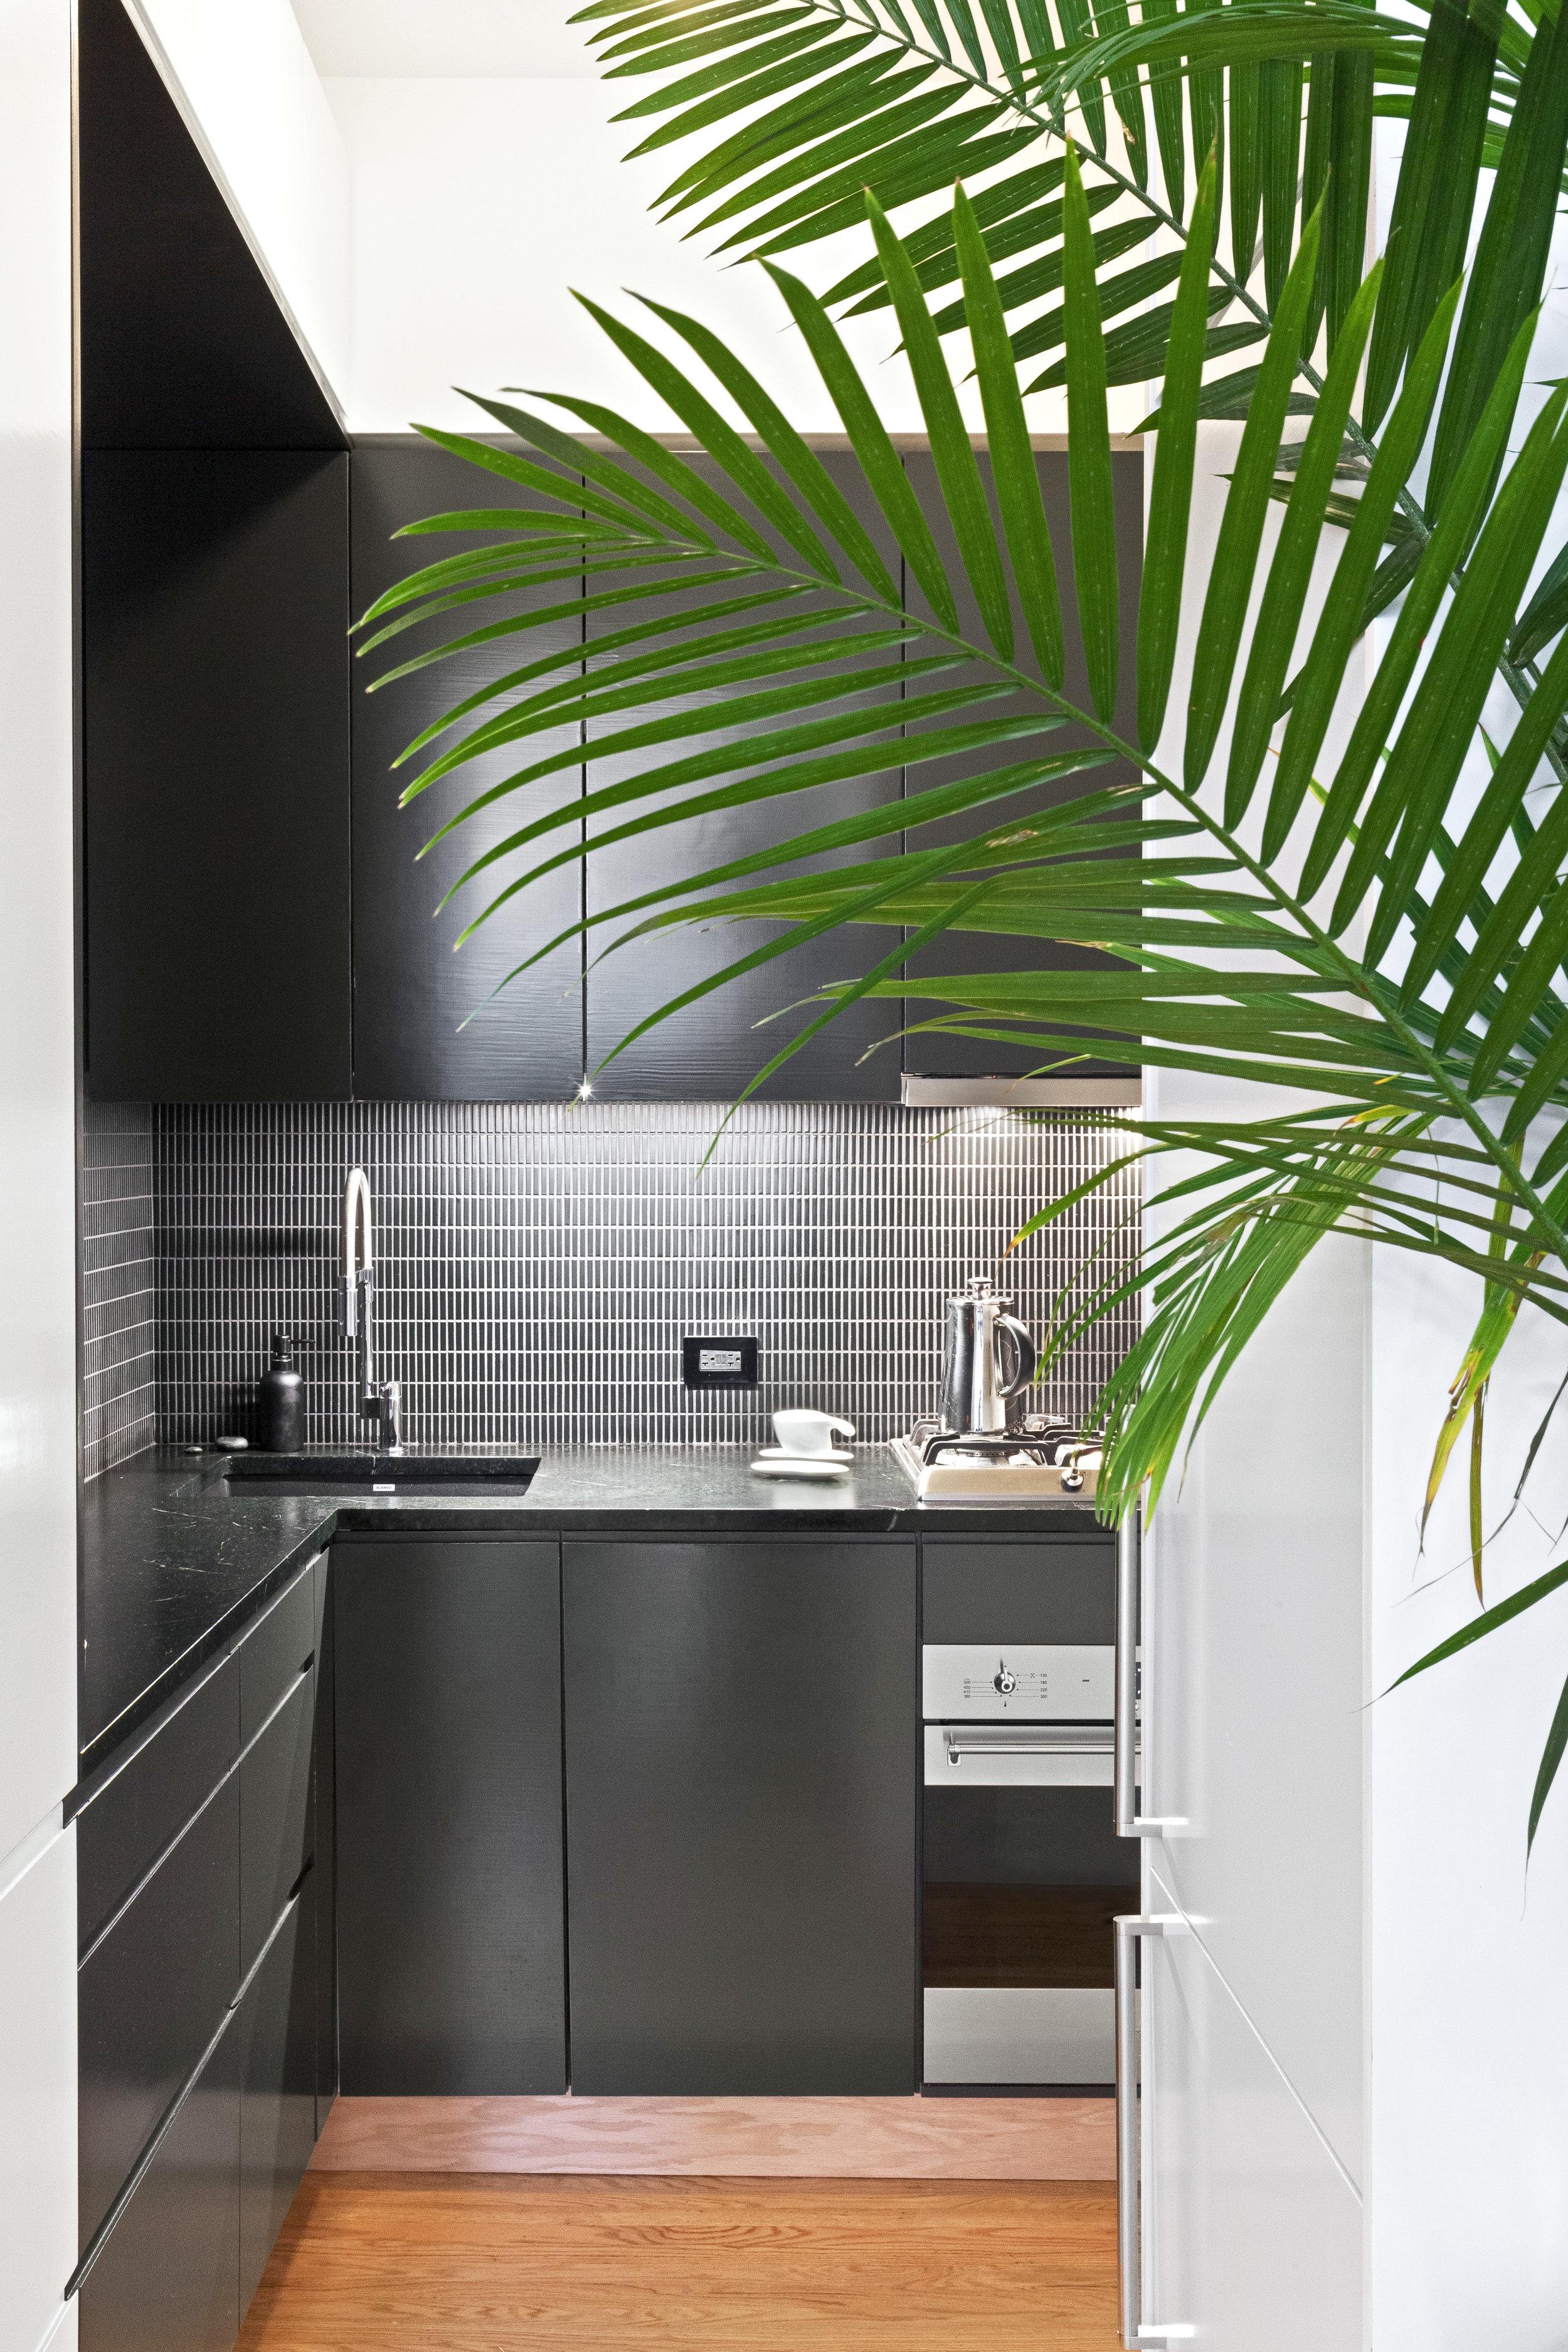 Kitchen by Sweeten architect Bureau.